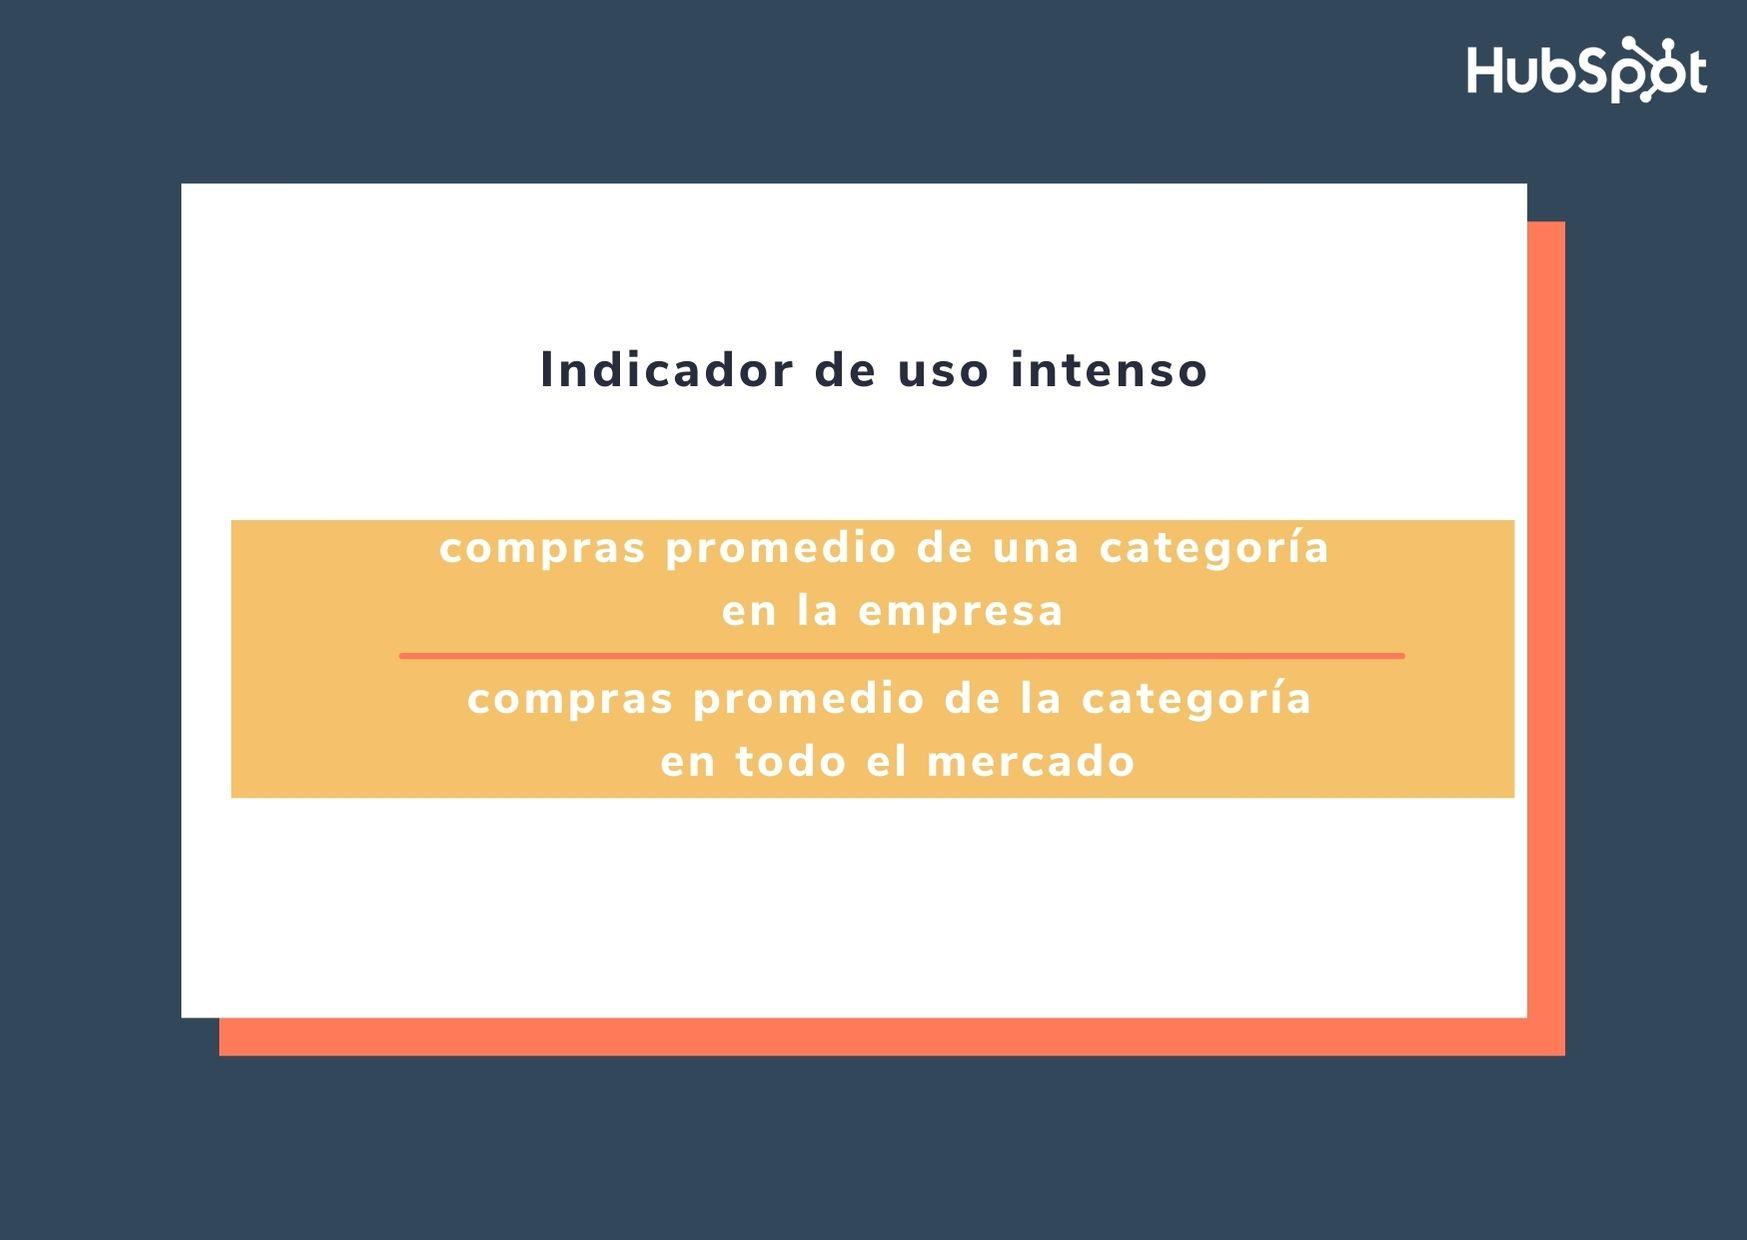 Fórmula para calcular el indicador de uso intenso para market share